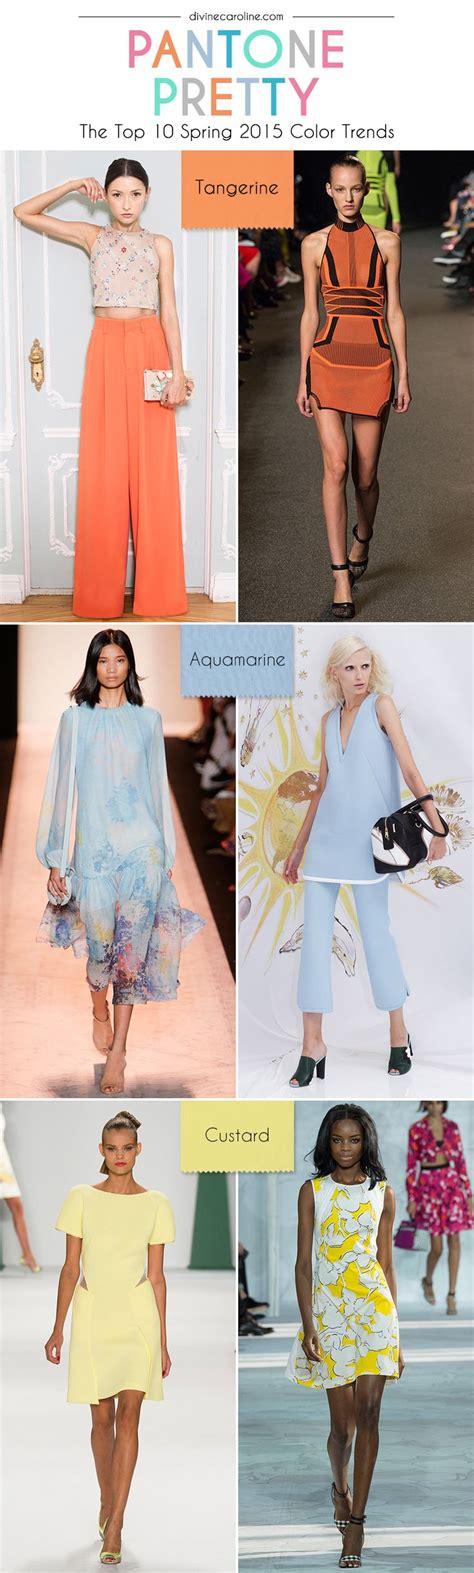 current color trends 1000 ideas about 2015 color trends on pinterest best